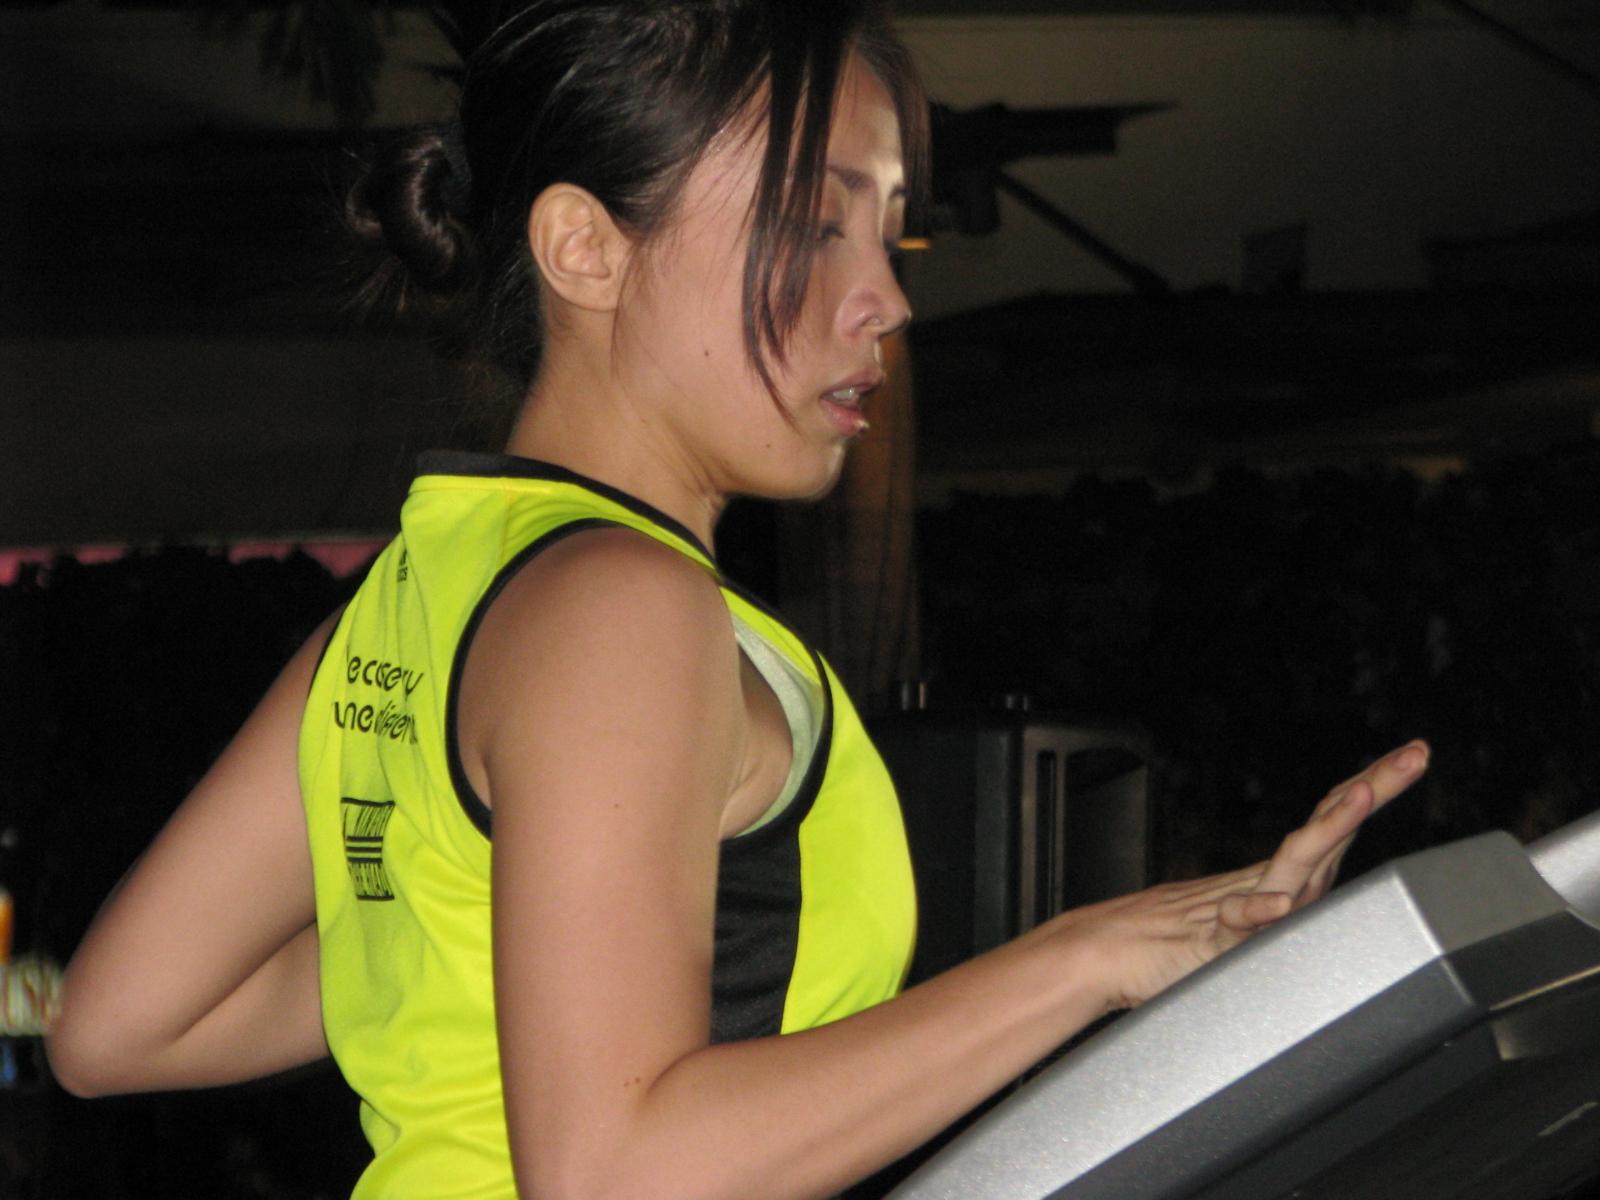 adidas miCoach Launch: Treadmill Challenge